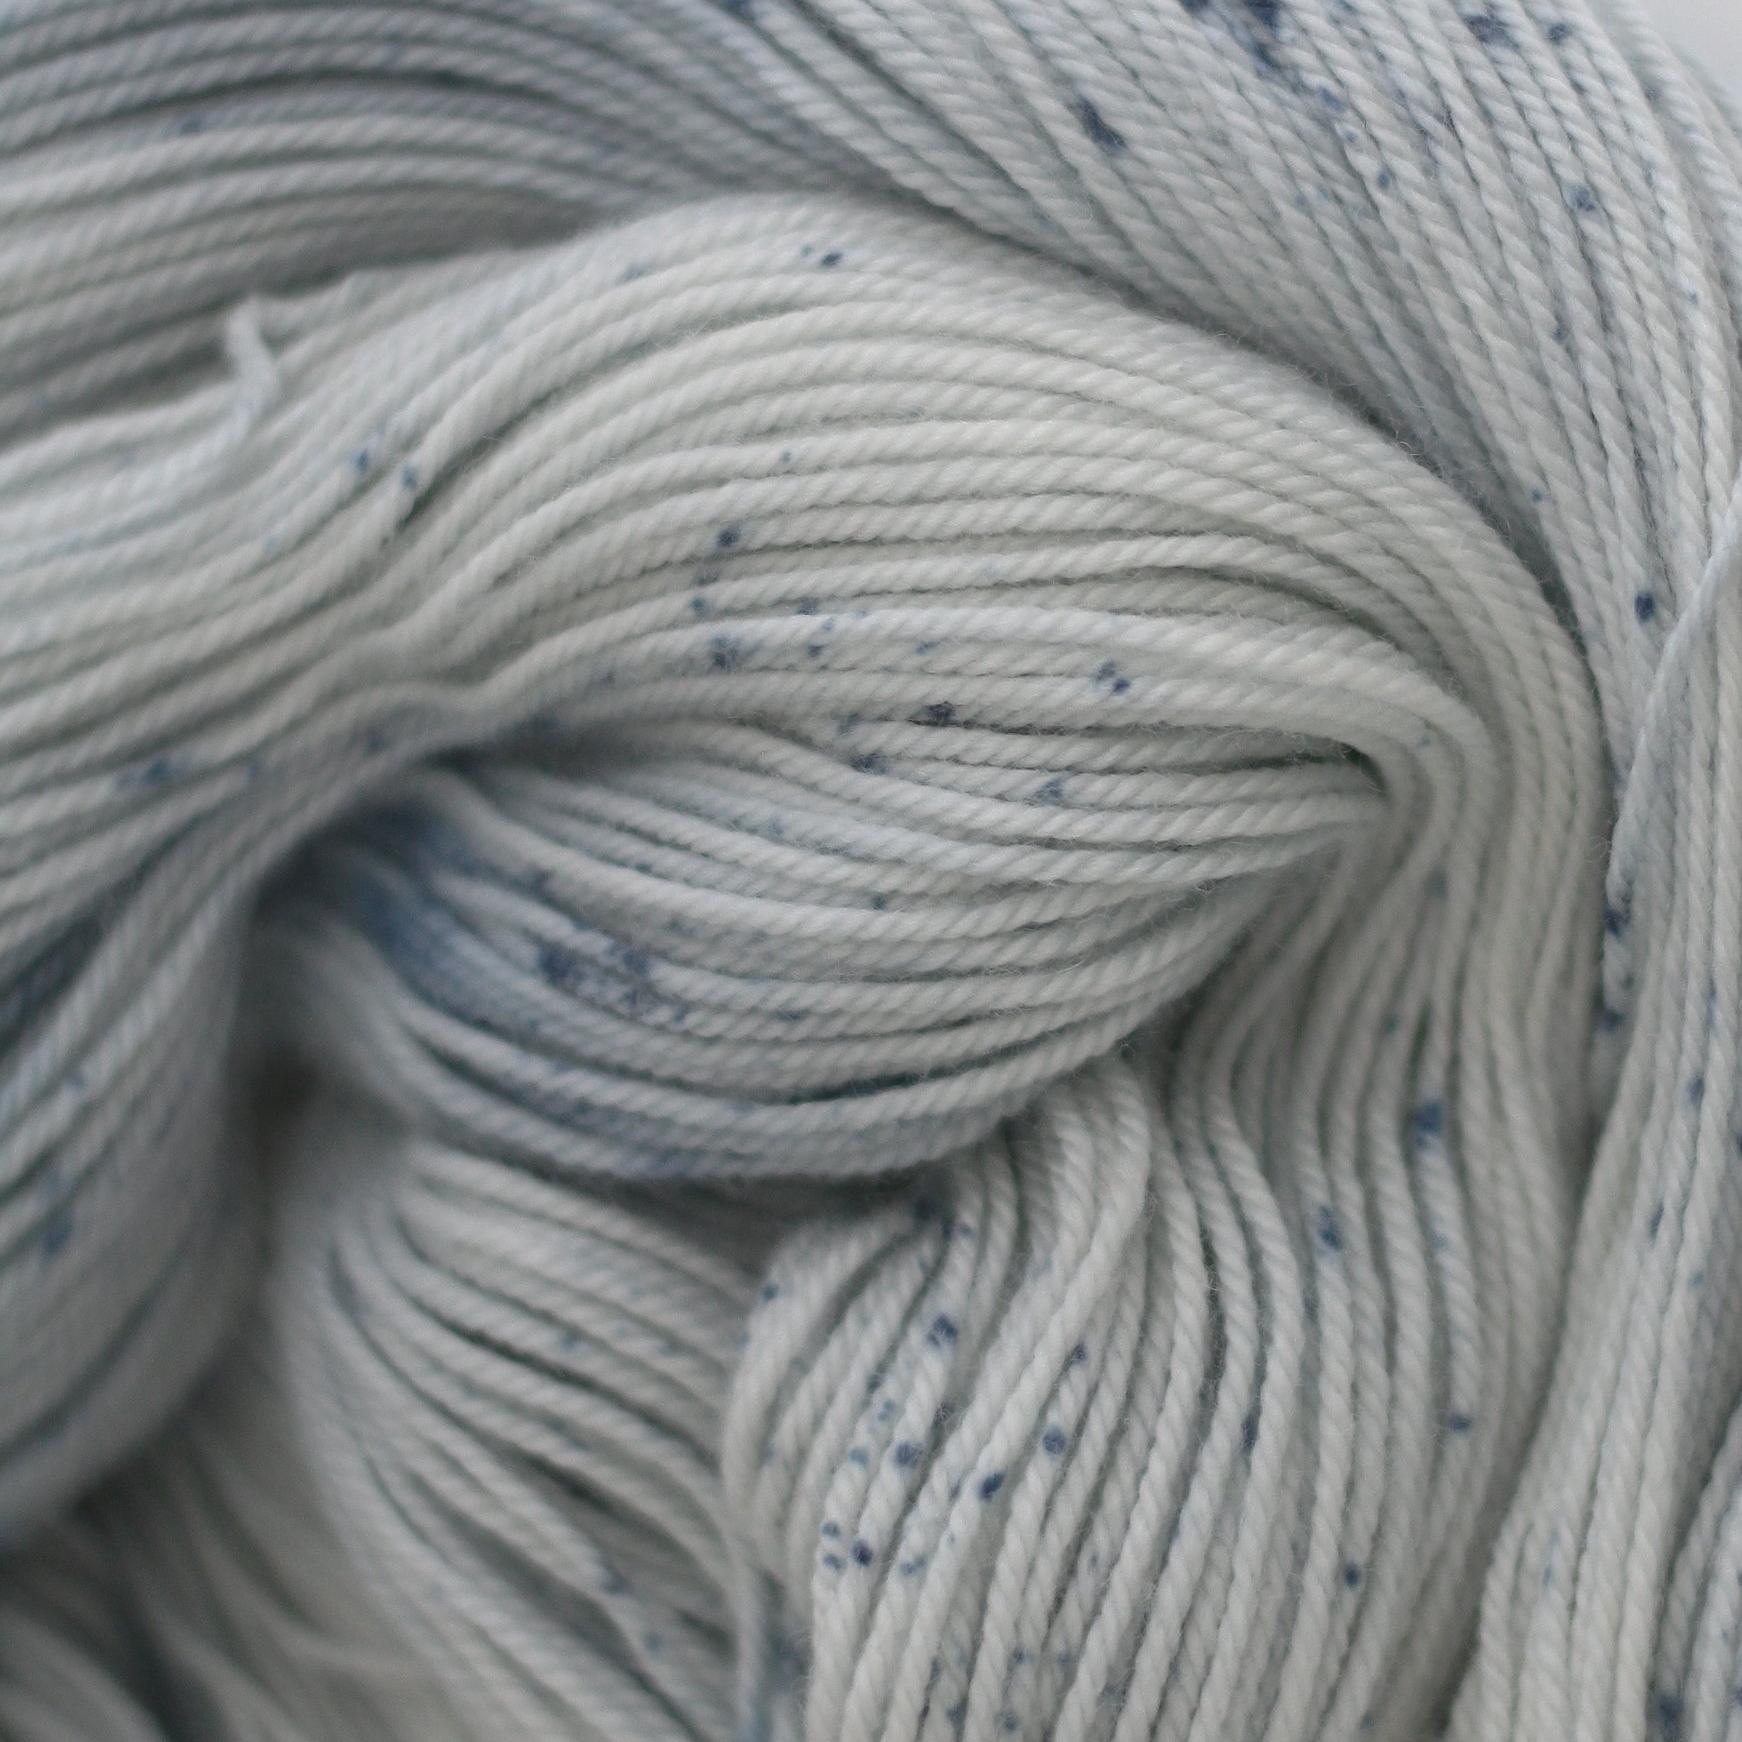 BLUE MOON     Indigo   Indigofera tinctoria